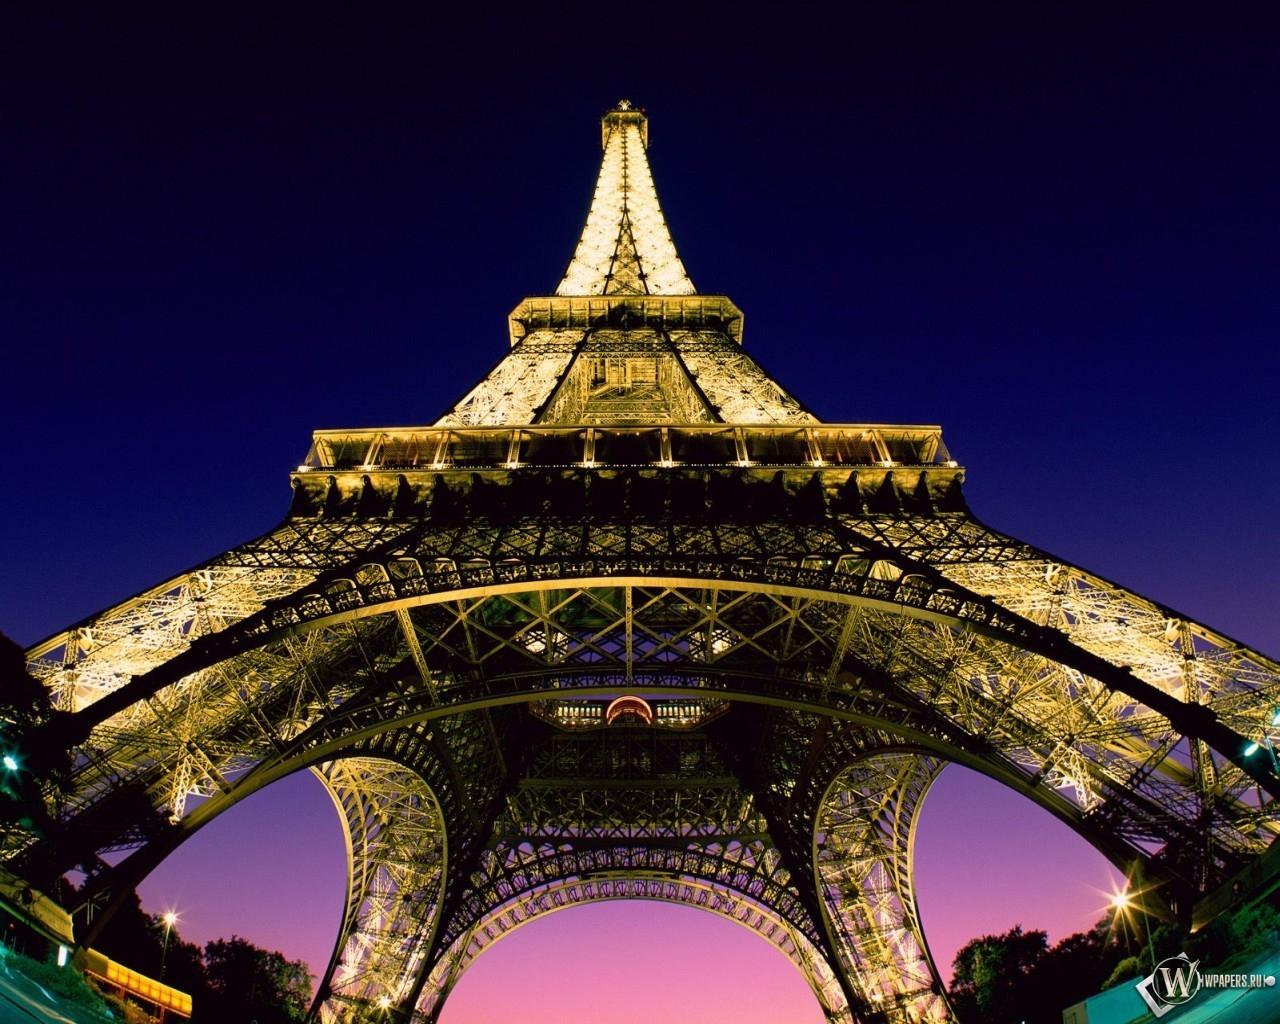 Beneath the Eiffel Tower - Paris - France 1280x1024